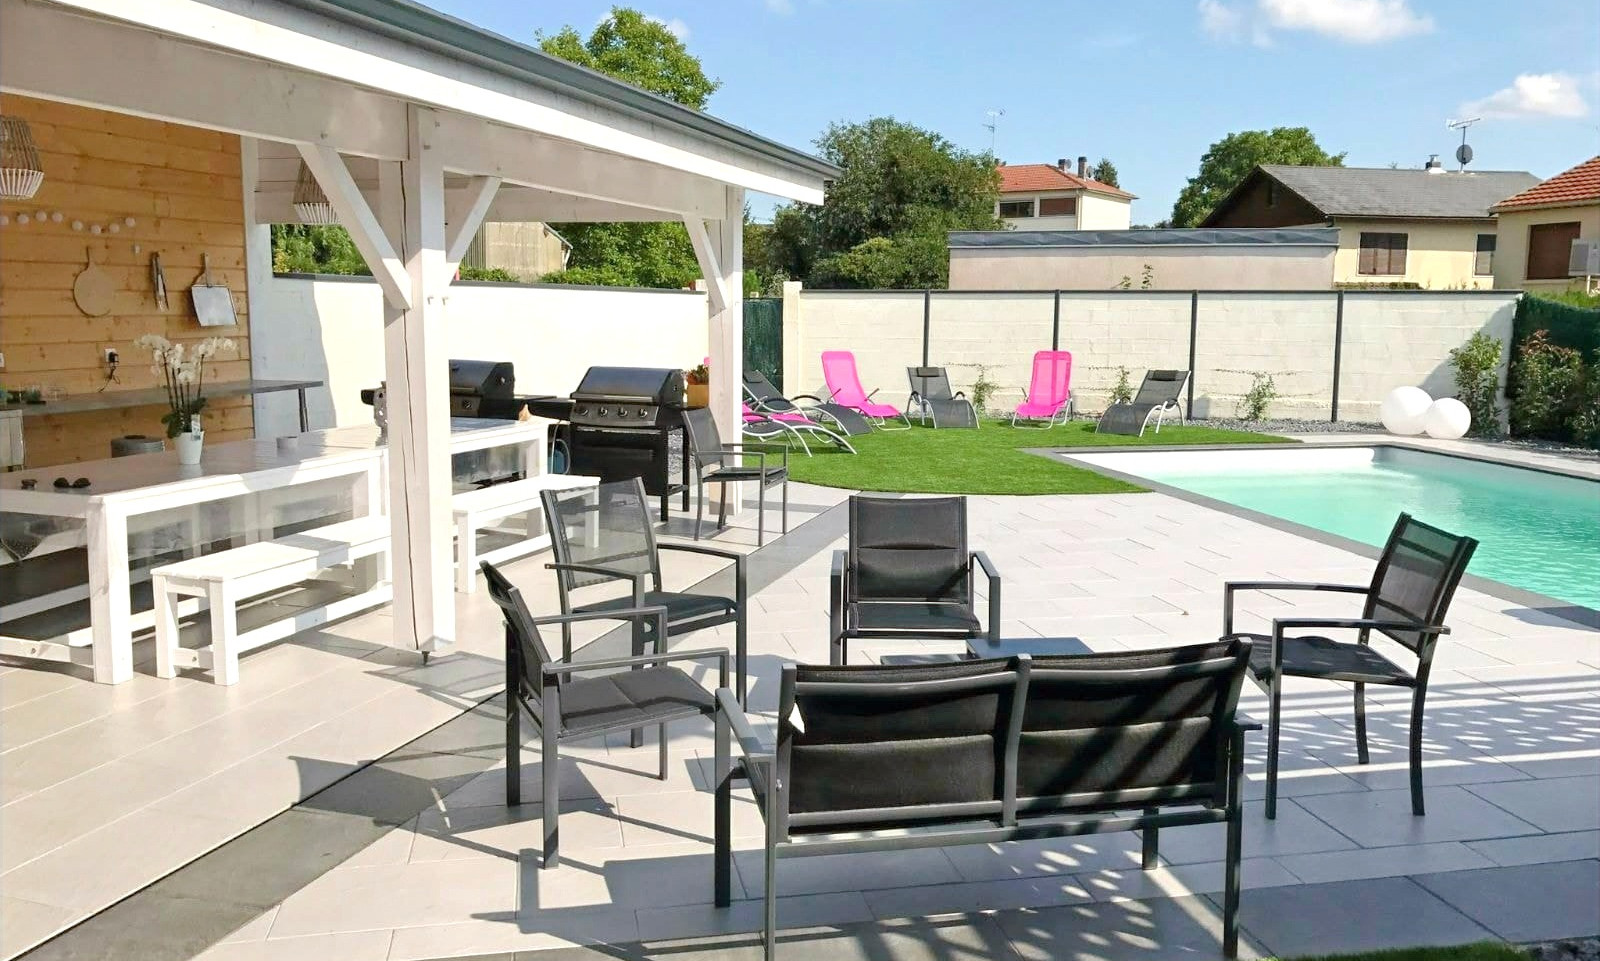 terrasse-piscine-maison-qualite-paysage_